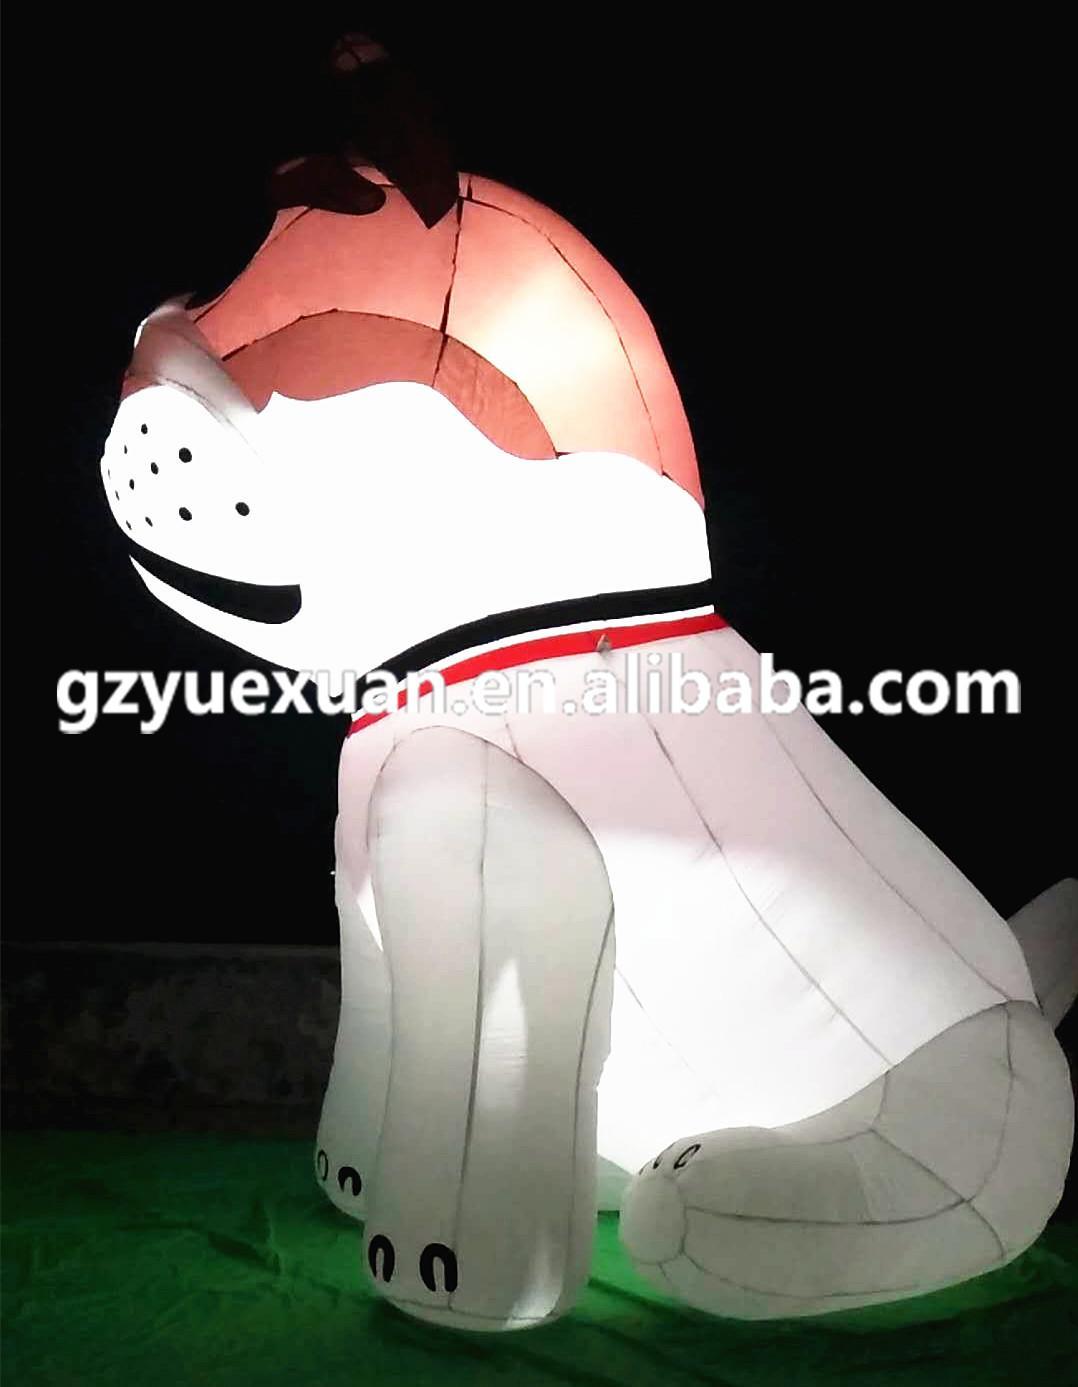 Giant inflatable dog with custom printing logo 1